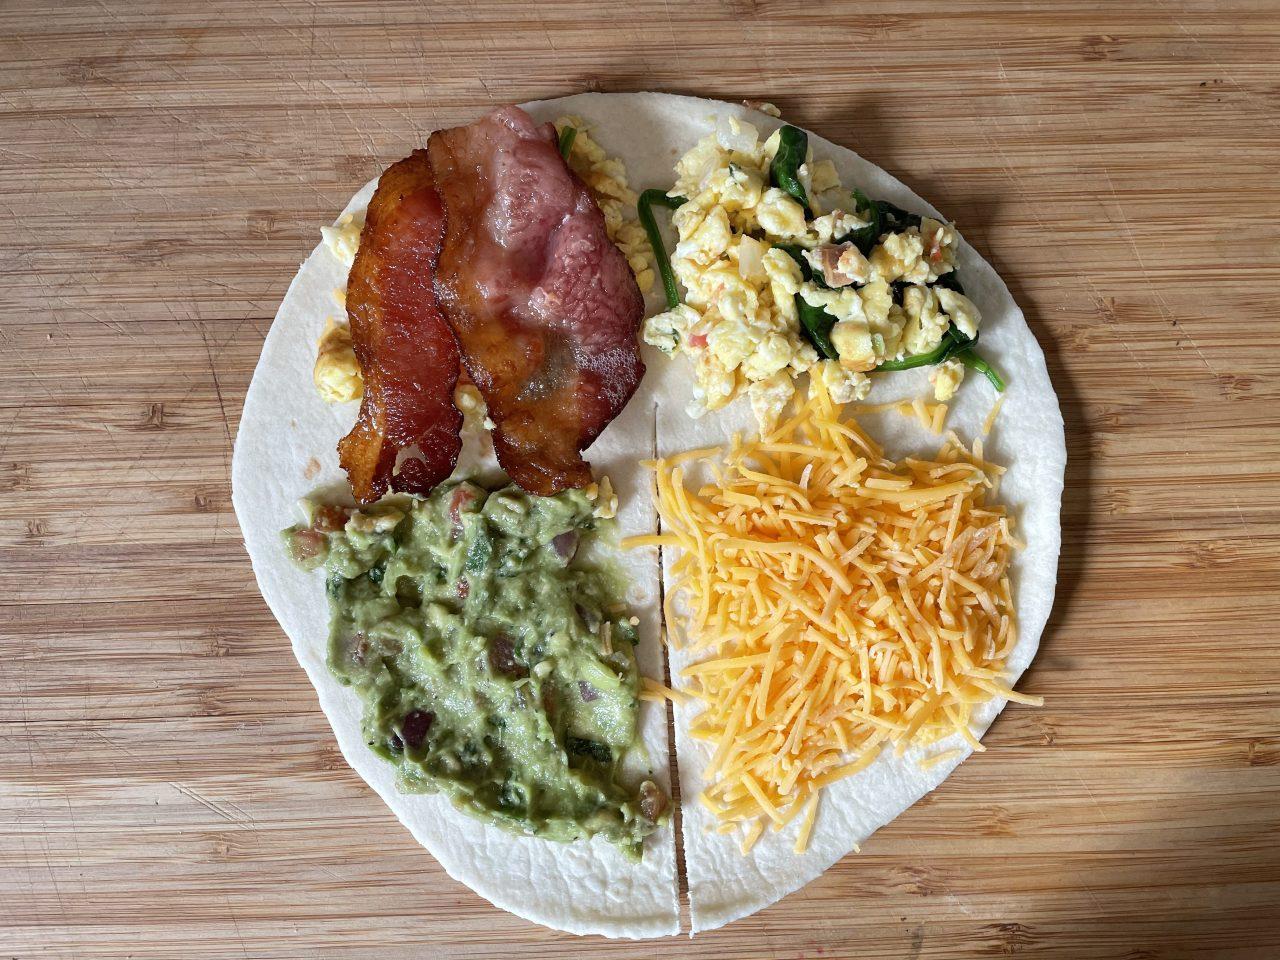 This Wrap Hack from Tik Tok Makes a Delicious Lunch ...  |Tiktok Wraps